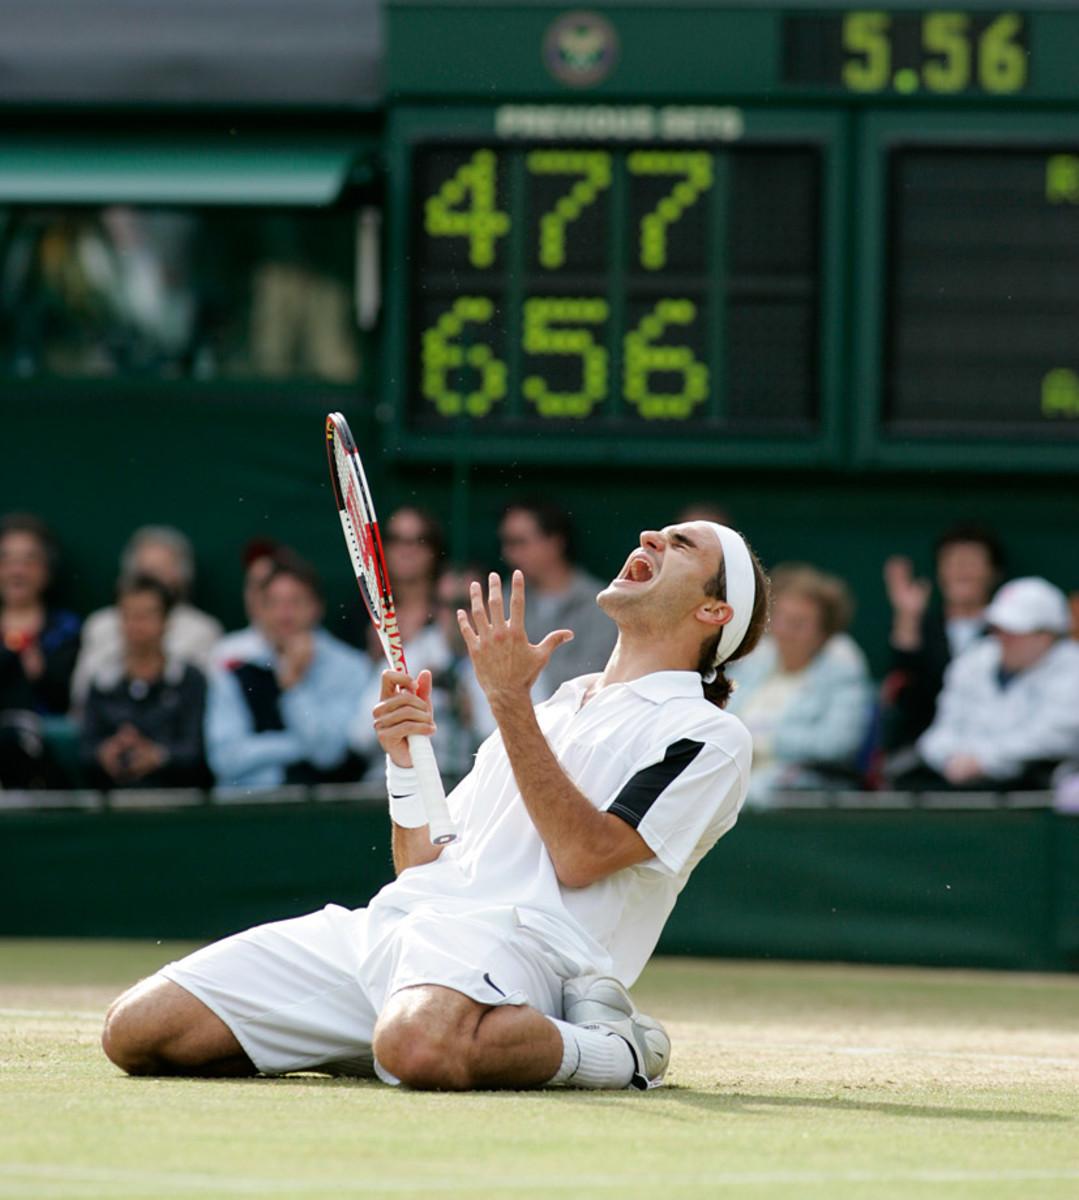 Roger-Federer-2004-Wimbledon.jpg